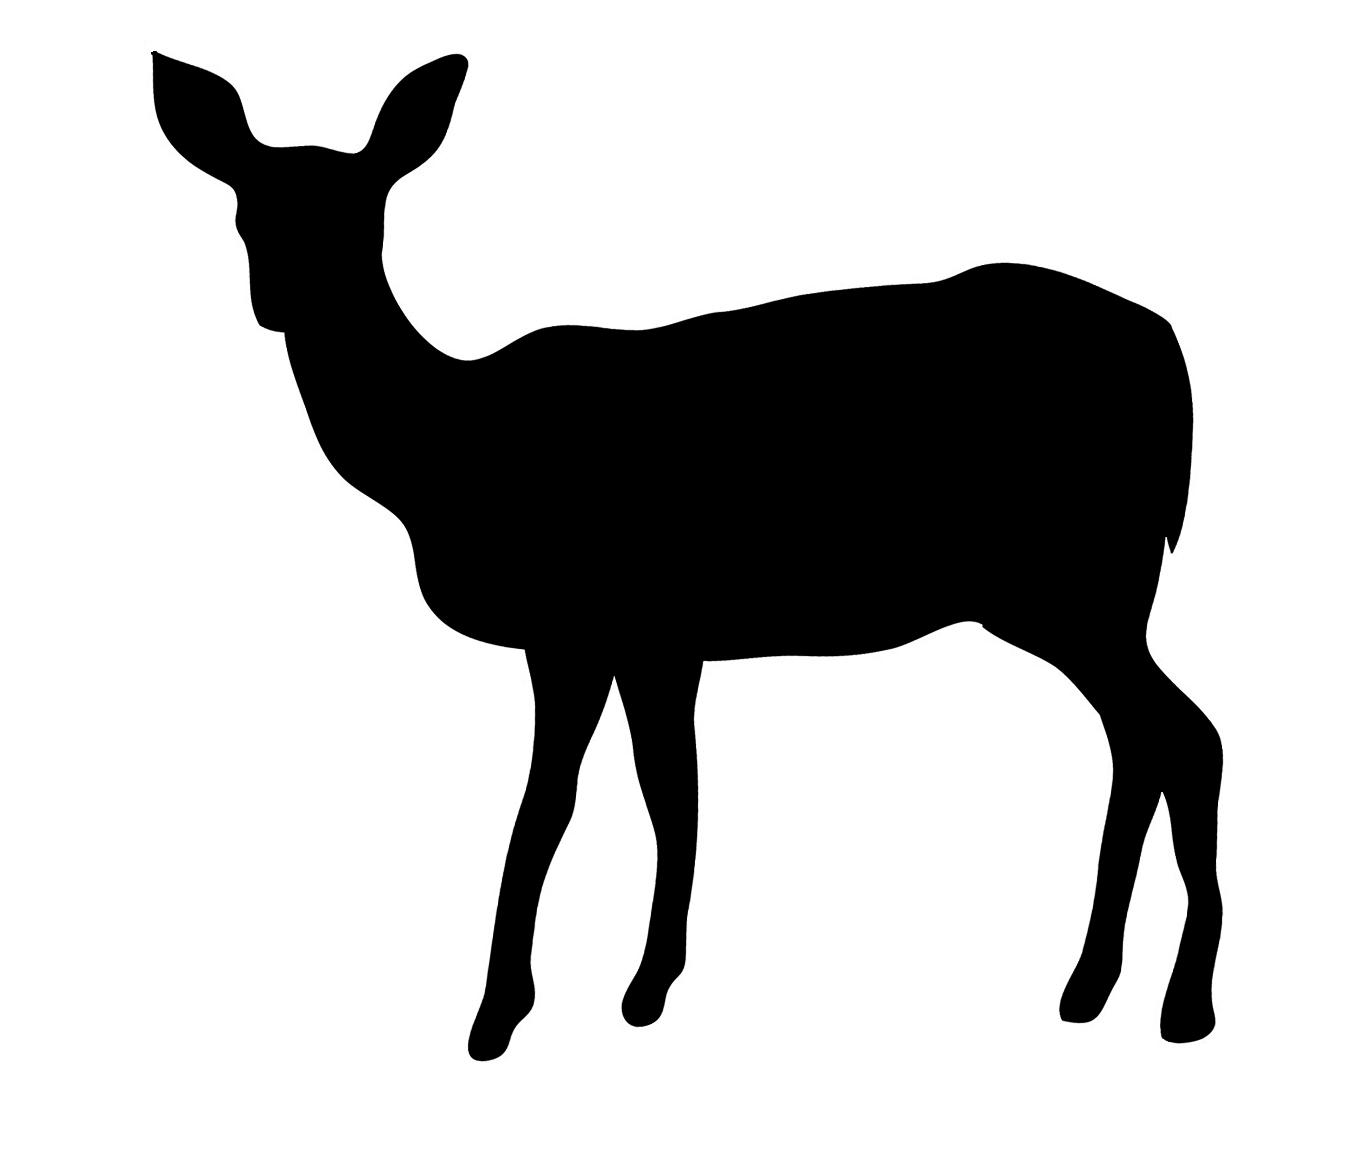 1349x1173 Free Deer Silhouette Free Download Clip Art Free Clip Art